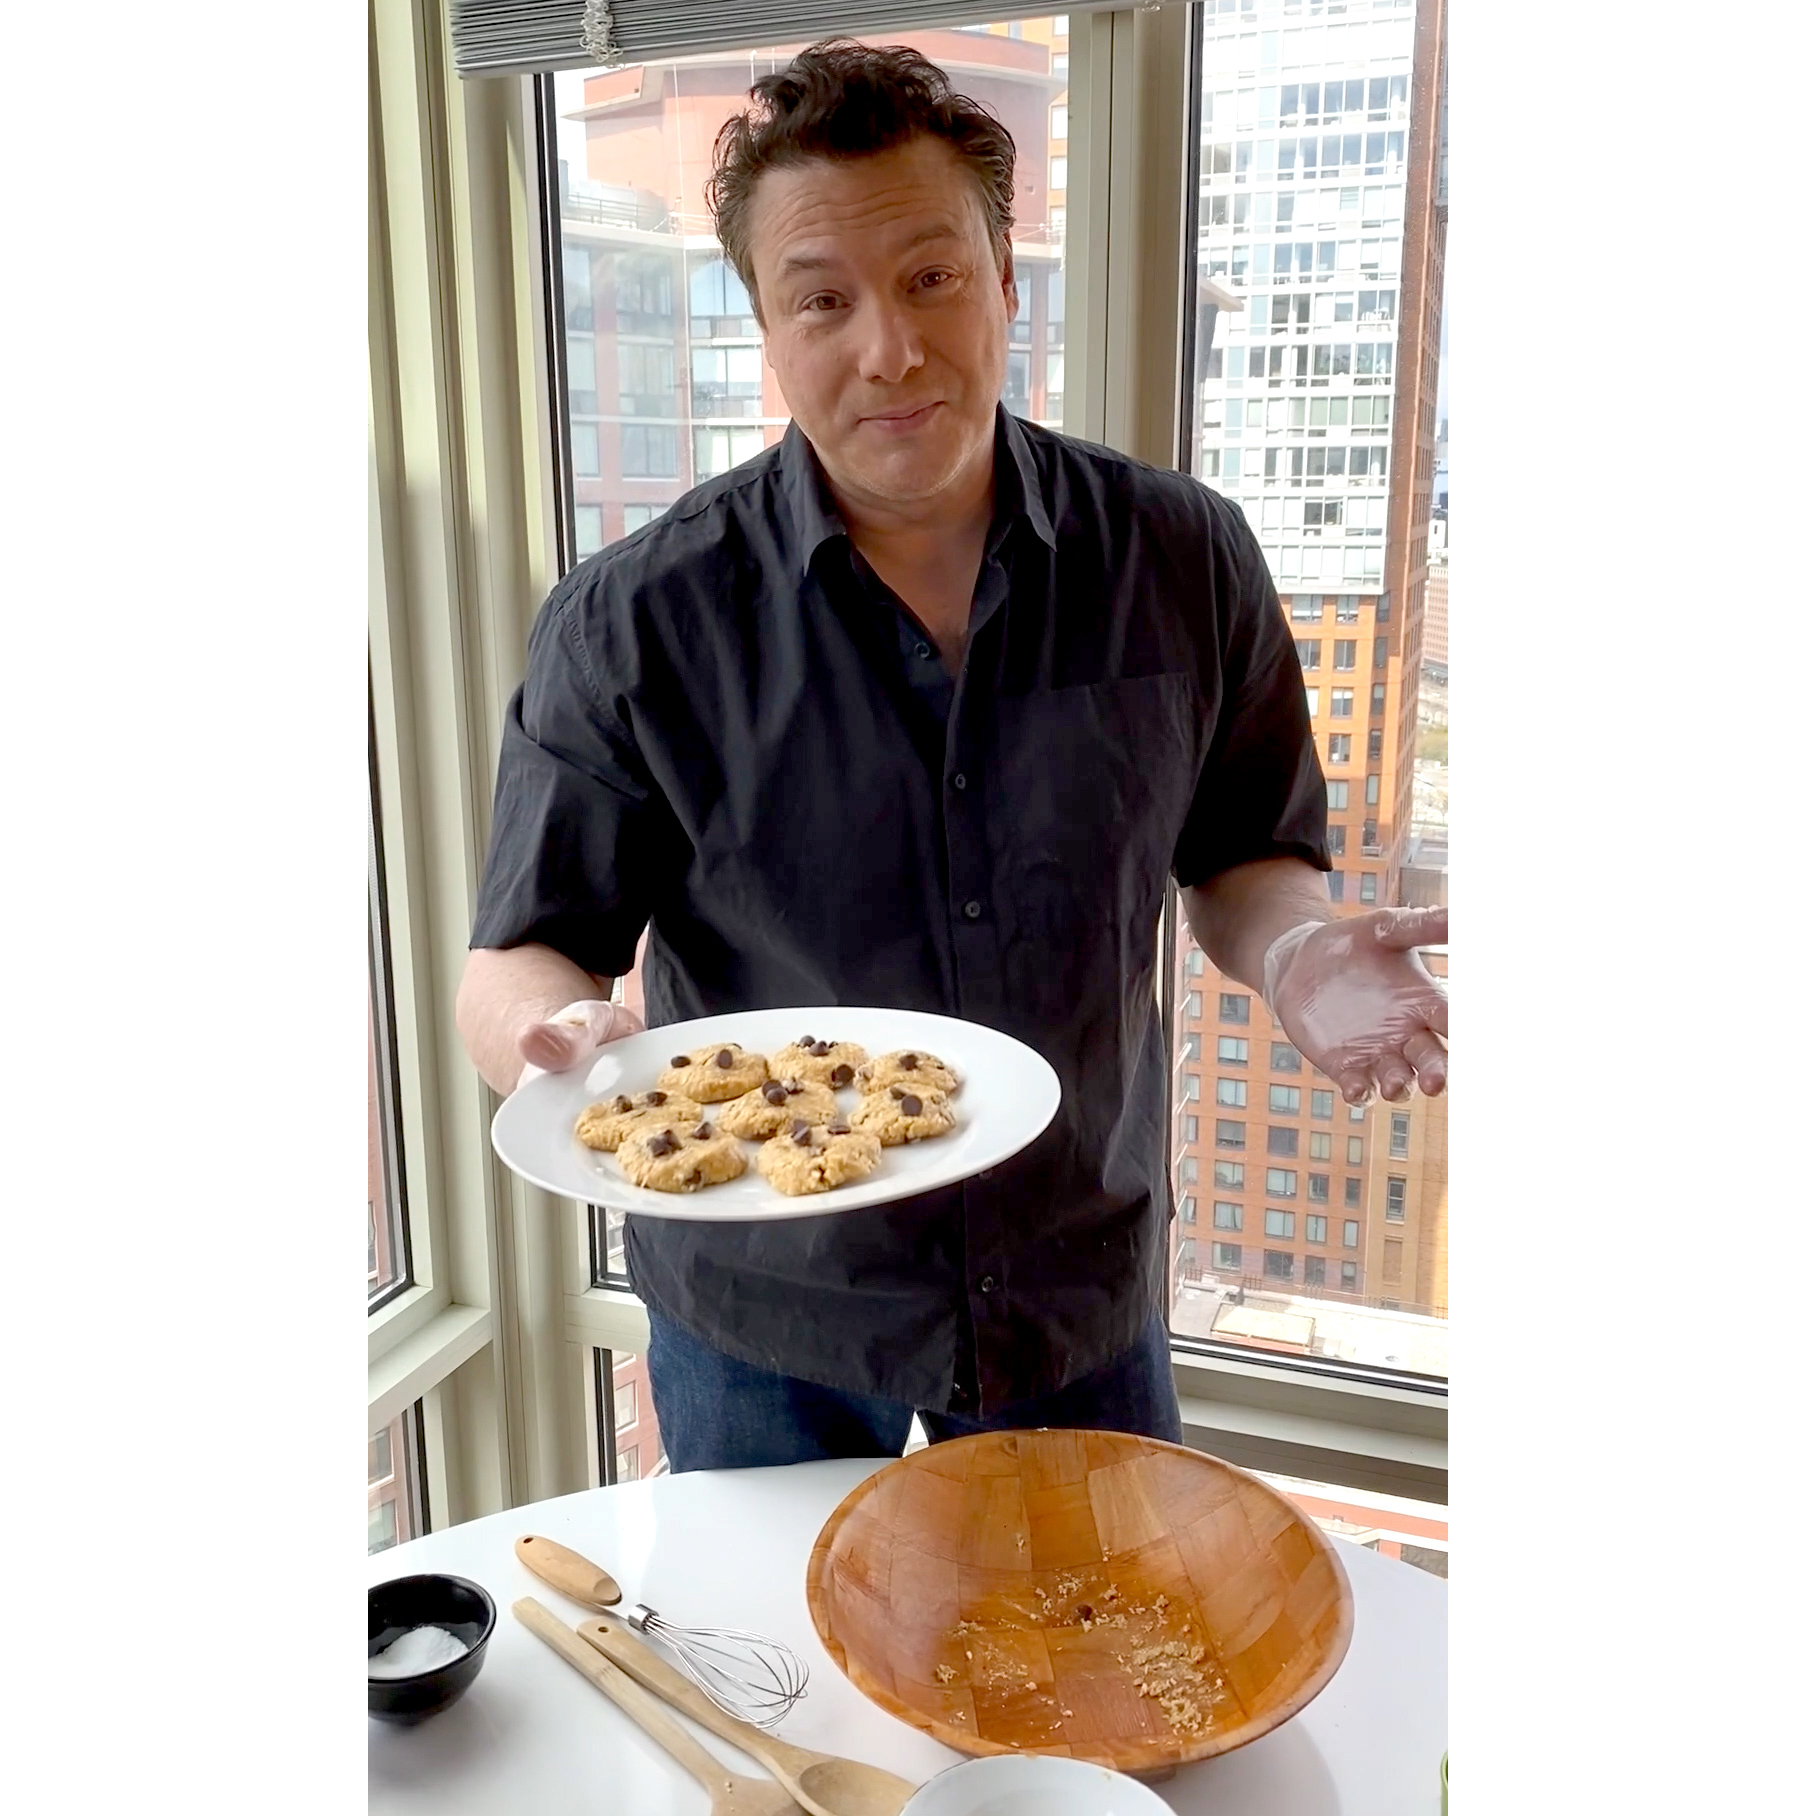 Chef Rocco Dispirito Shares His Easy No-Bake Chocolate Chip Cookie Recipe 2